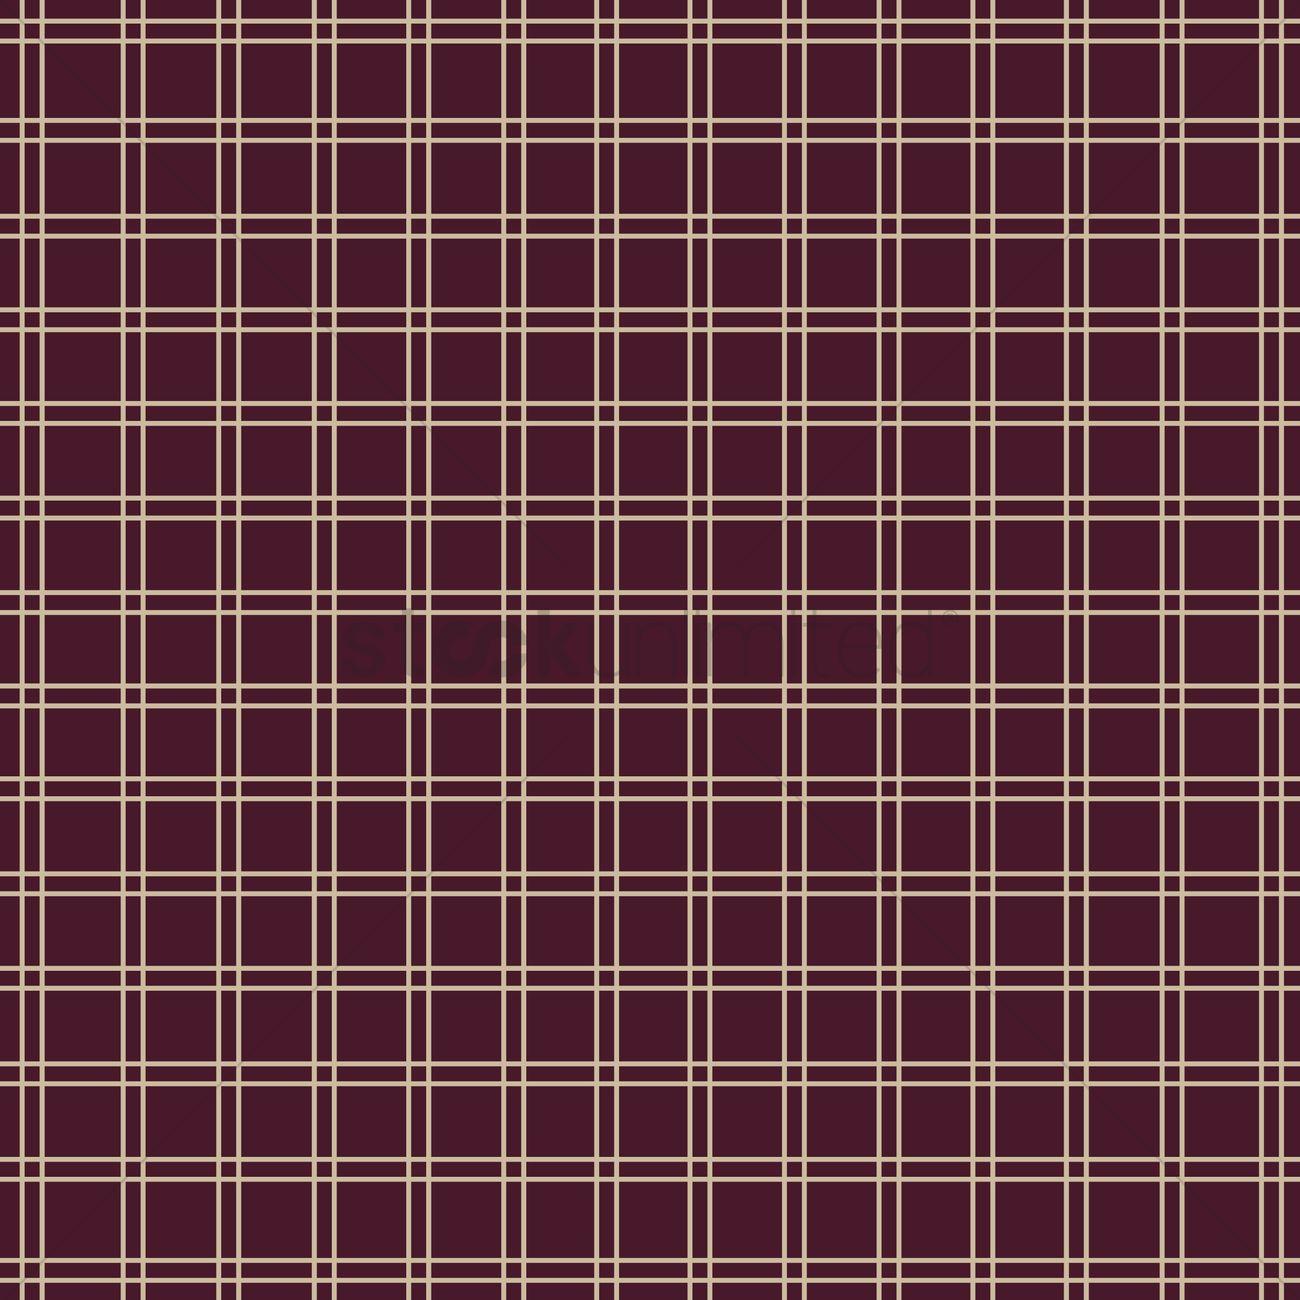 Checks pattern Vector Image - 1407726 | StockUnlimited